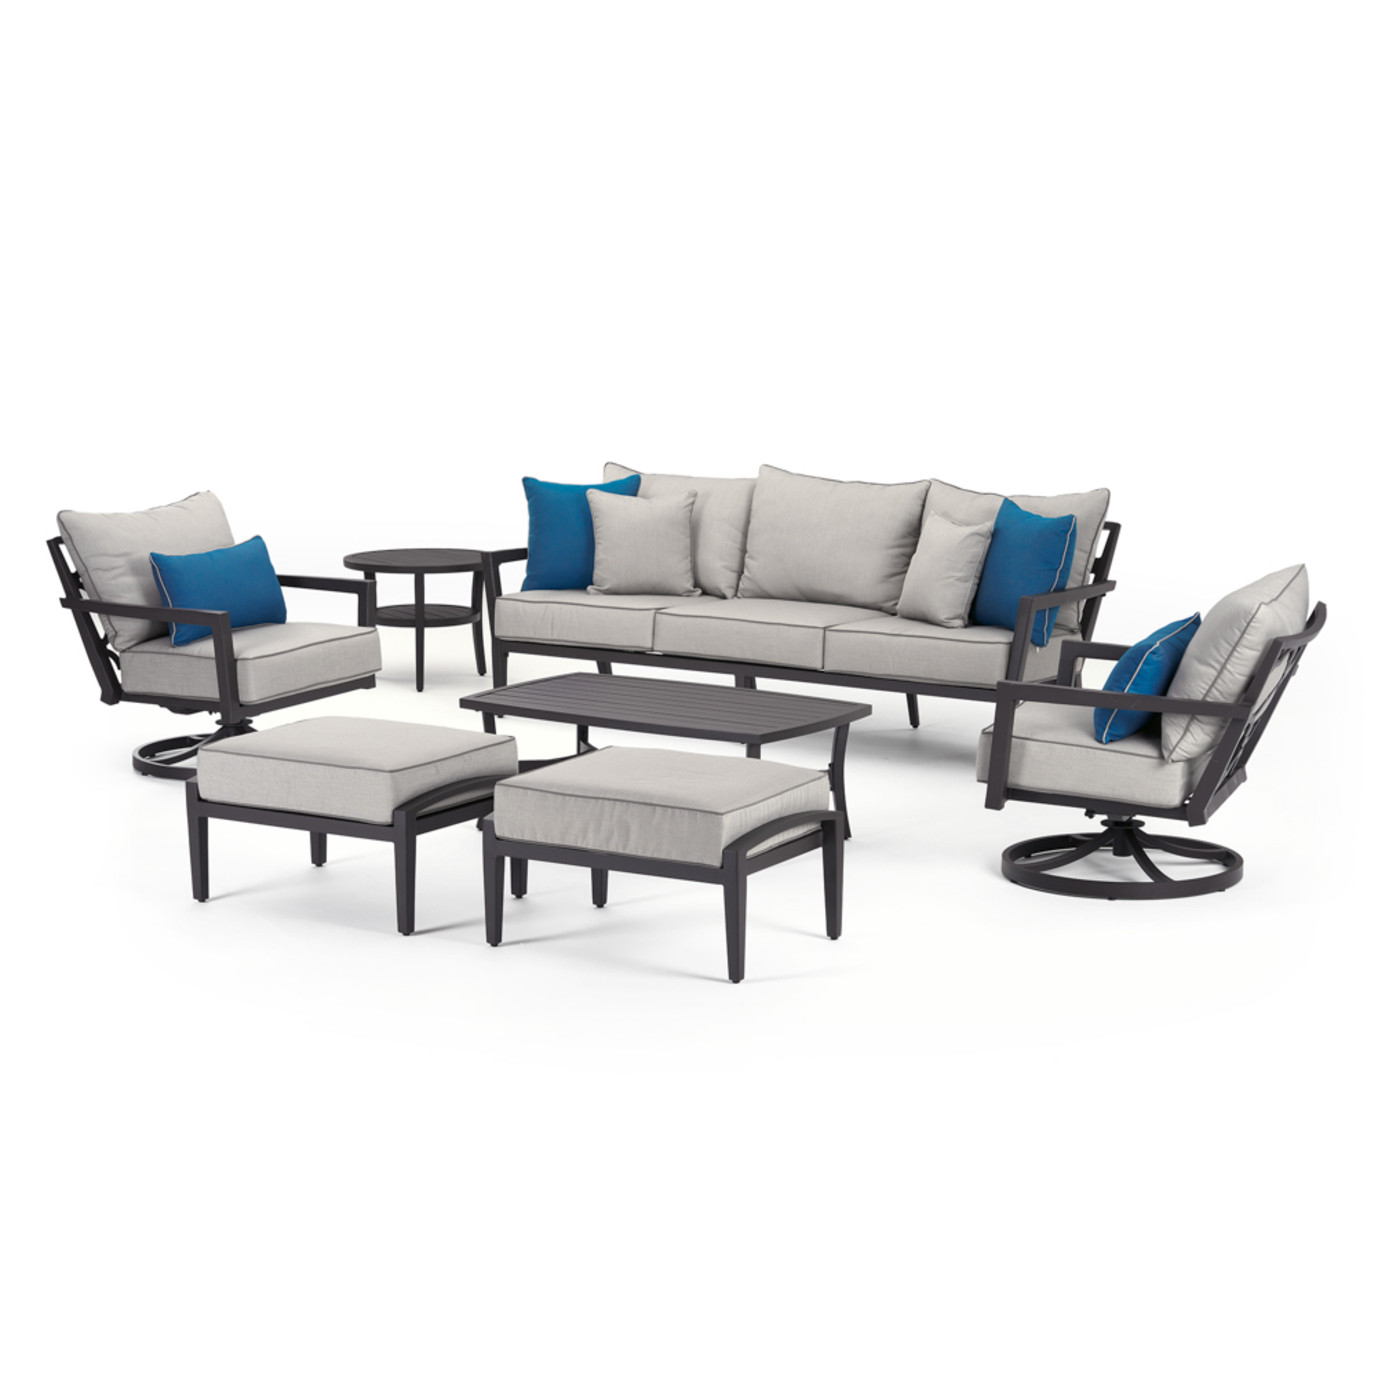 Venetia 7 Piece Motion Seating Set